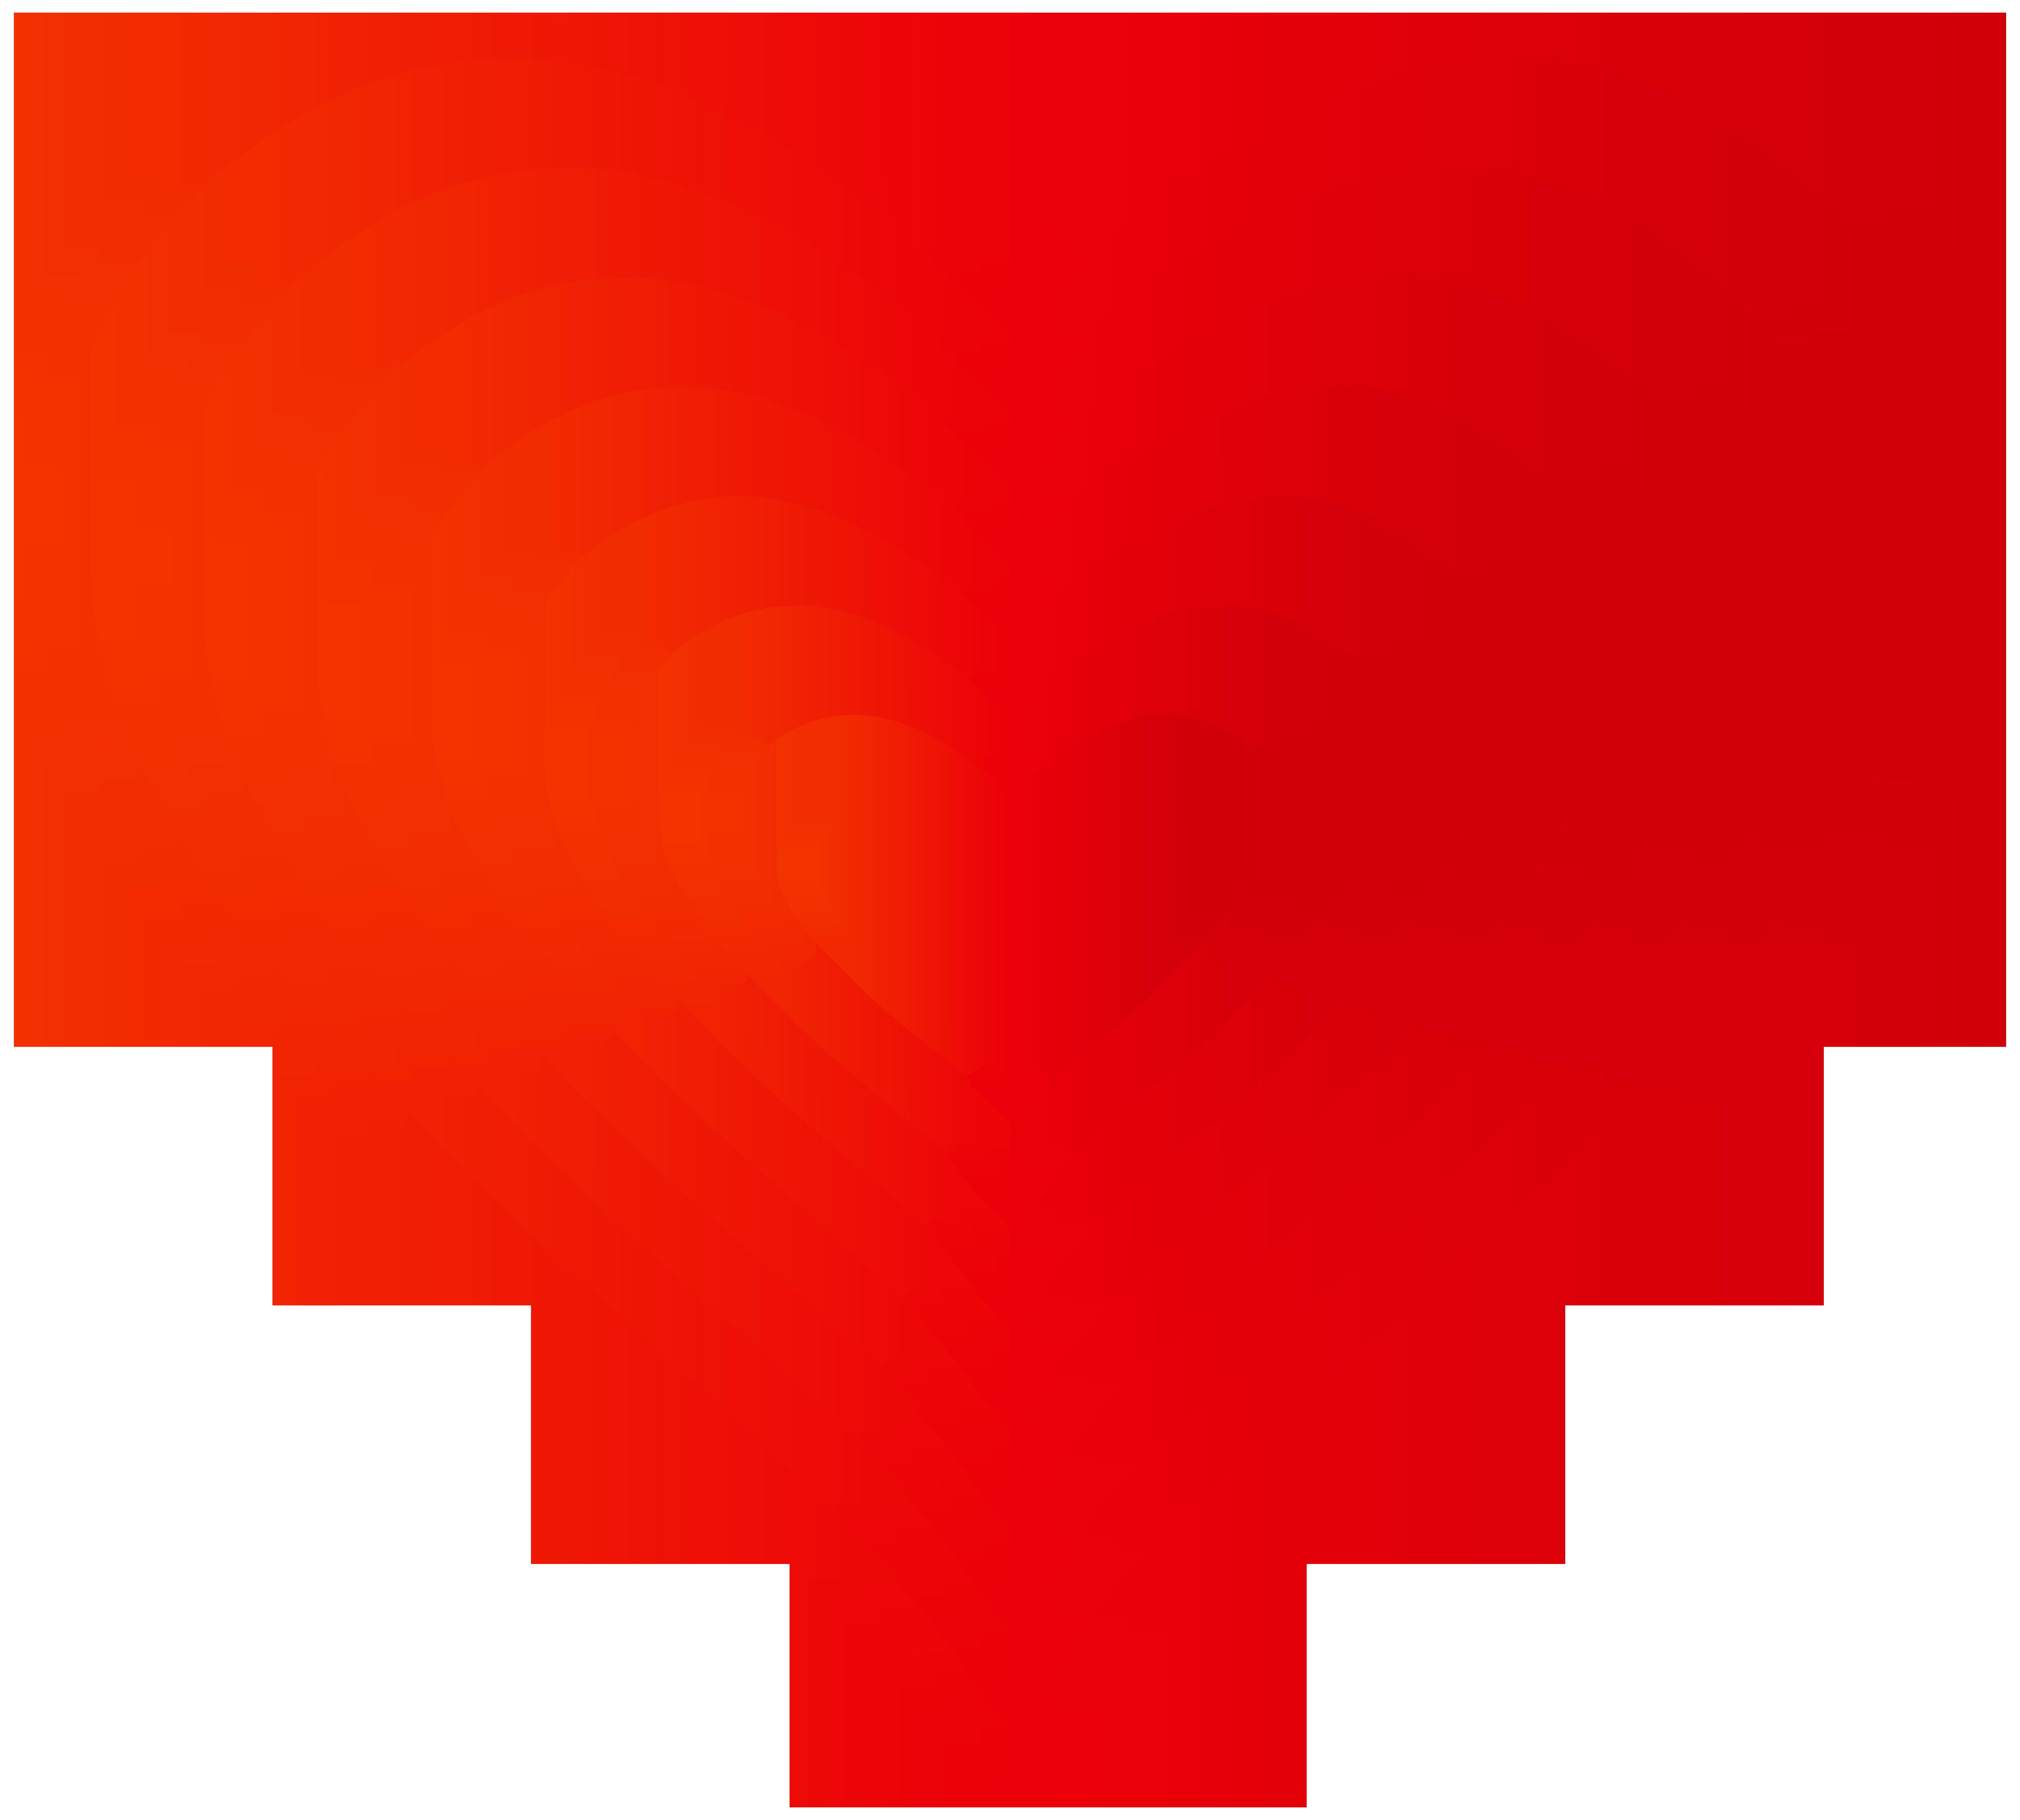 Line of hearts png. Heart decorative transparent clip